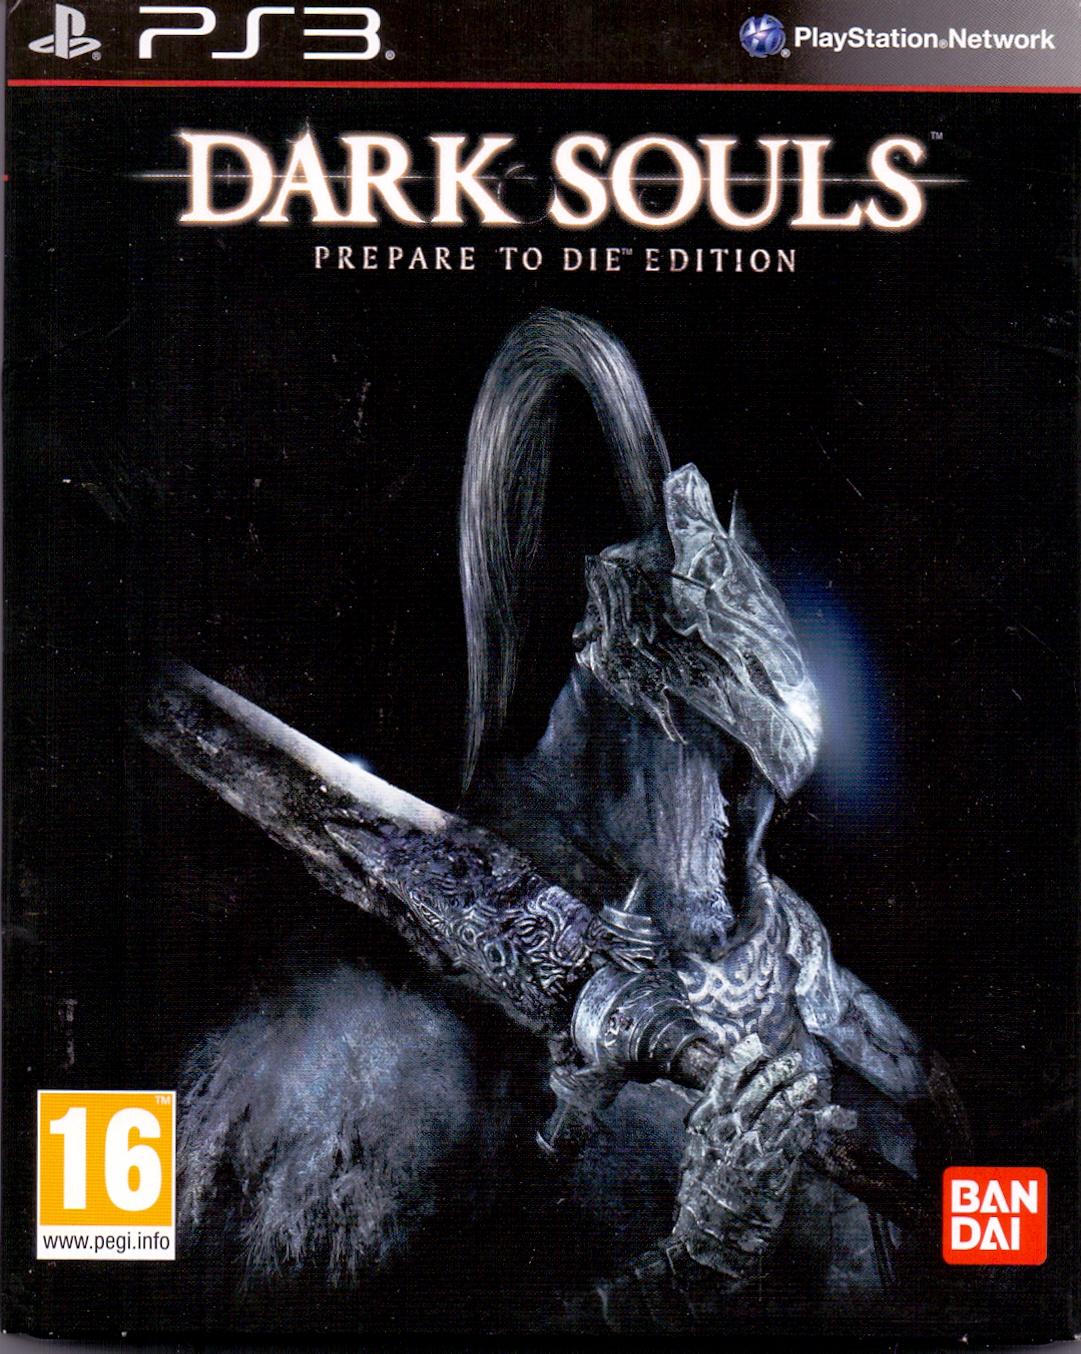 Dark Souls [Prepare to Die Edition, Limited Edition Steelbook, inkl. Soundtrack, Internationale Version]